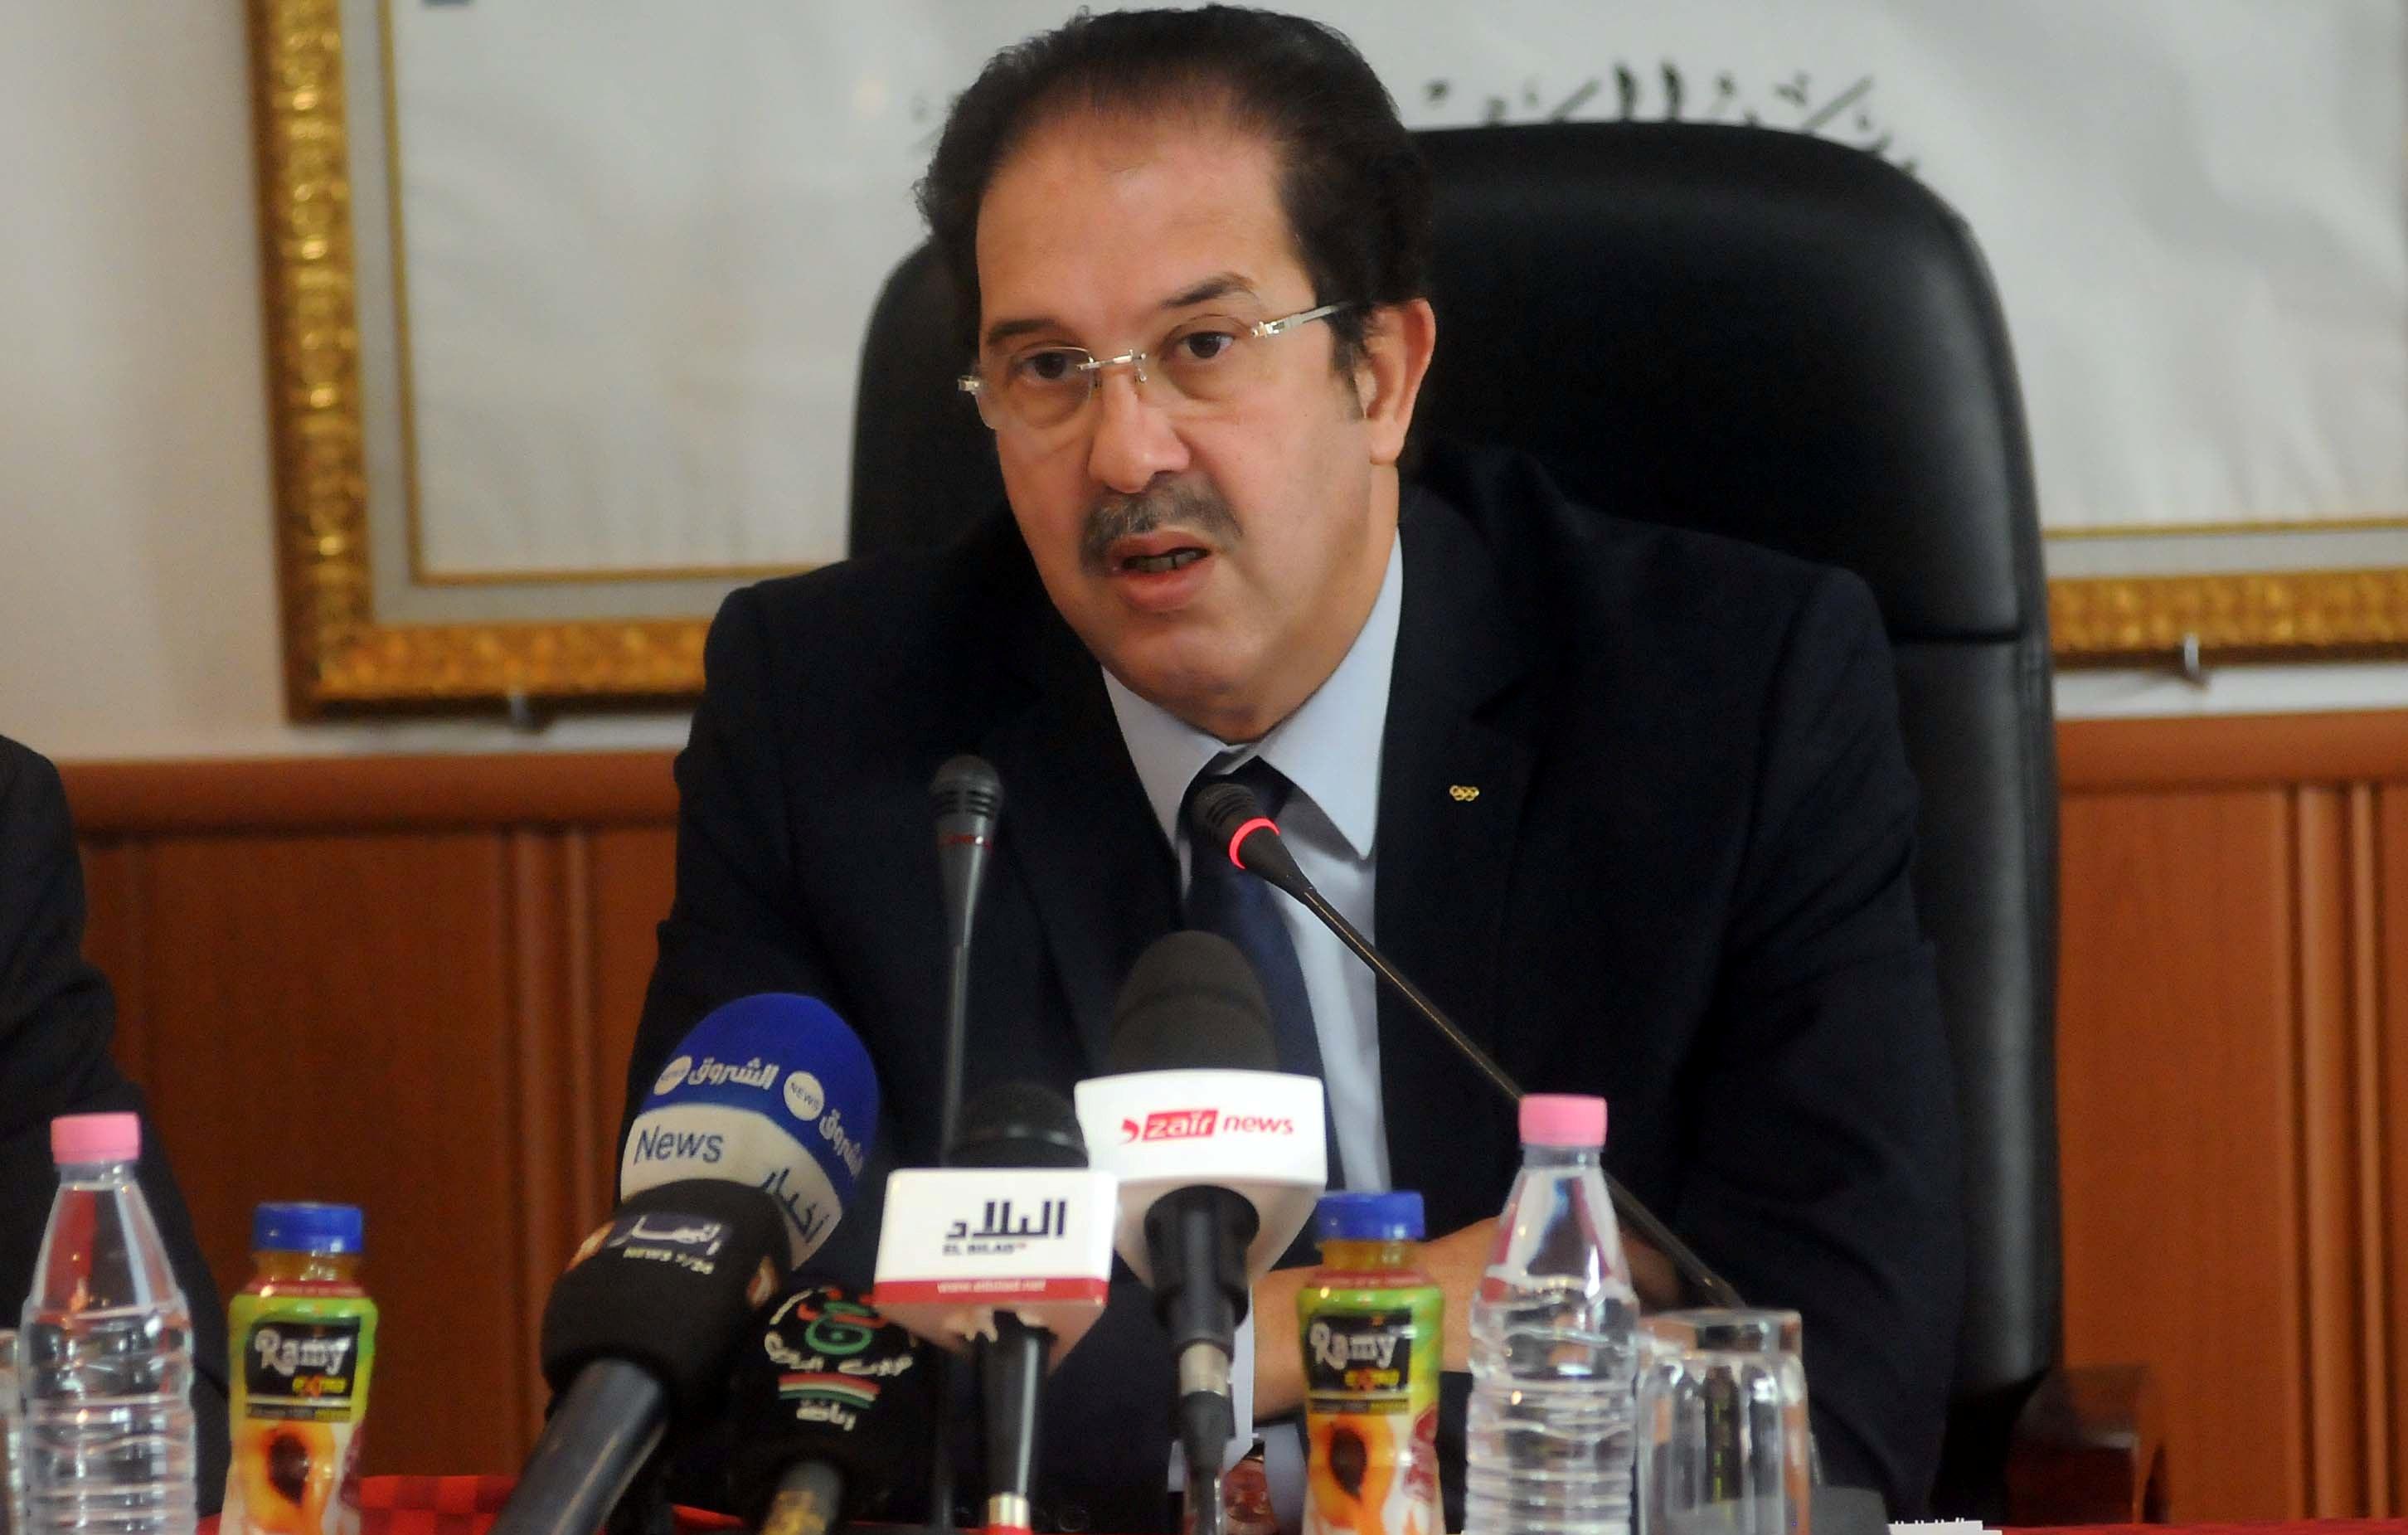 Mustapha Berraf, président du Comité olympique algérien (COA). New Press